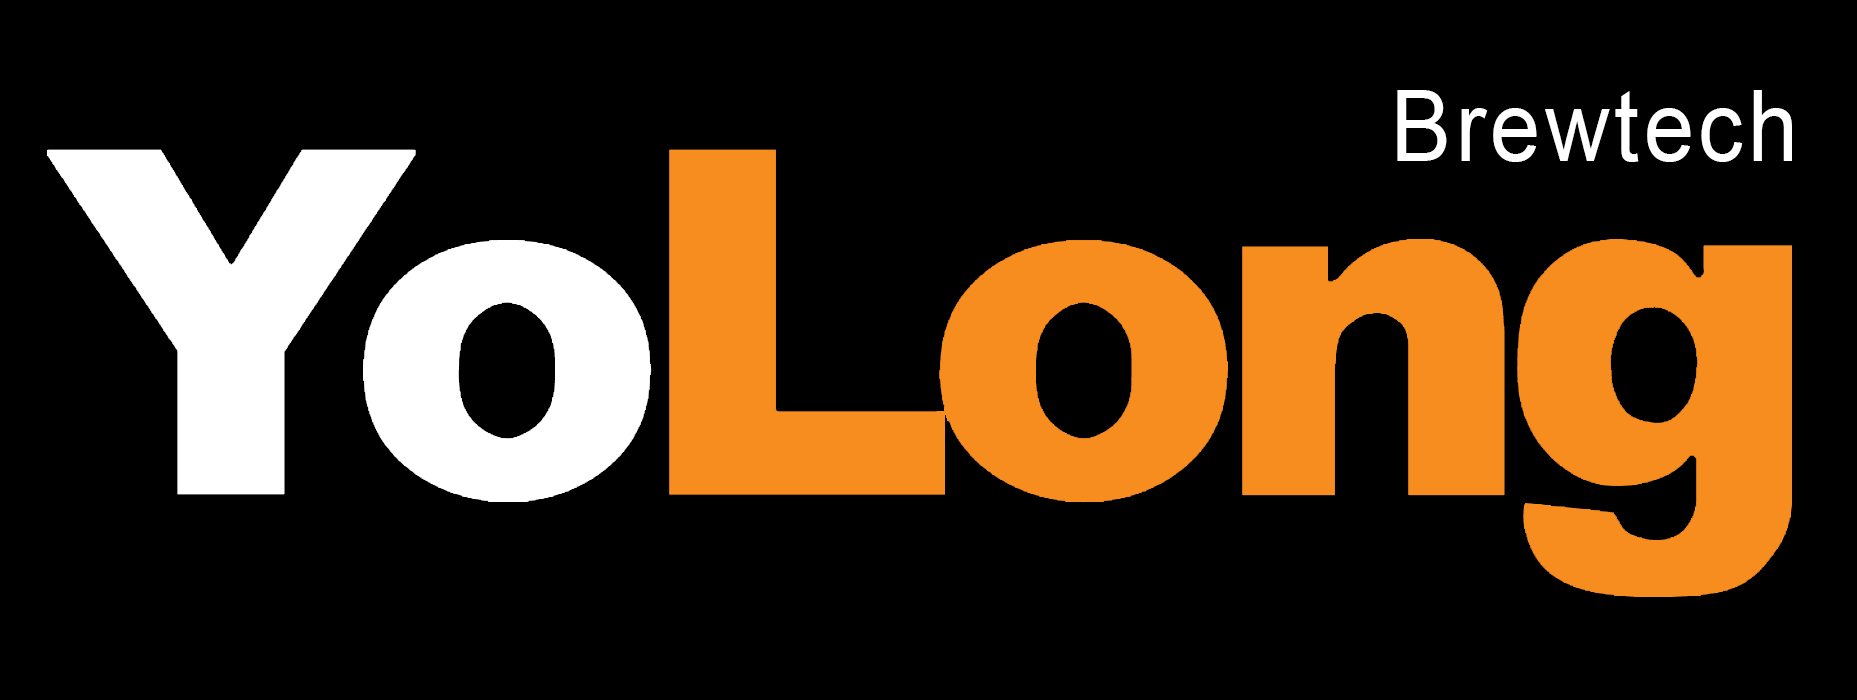 YoLong Brewtech